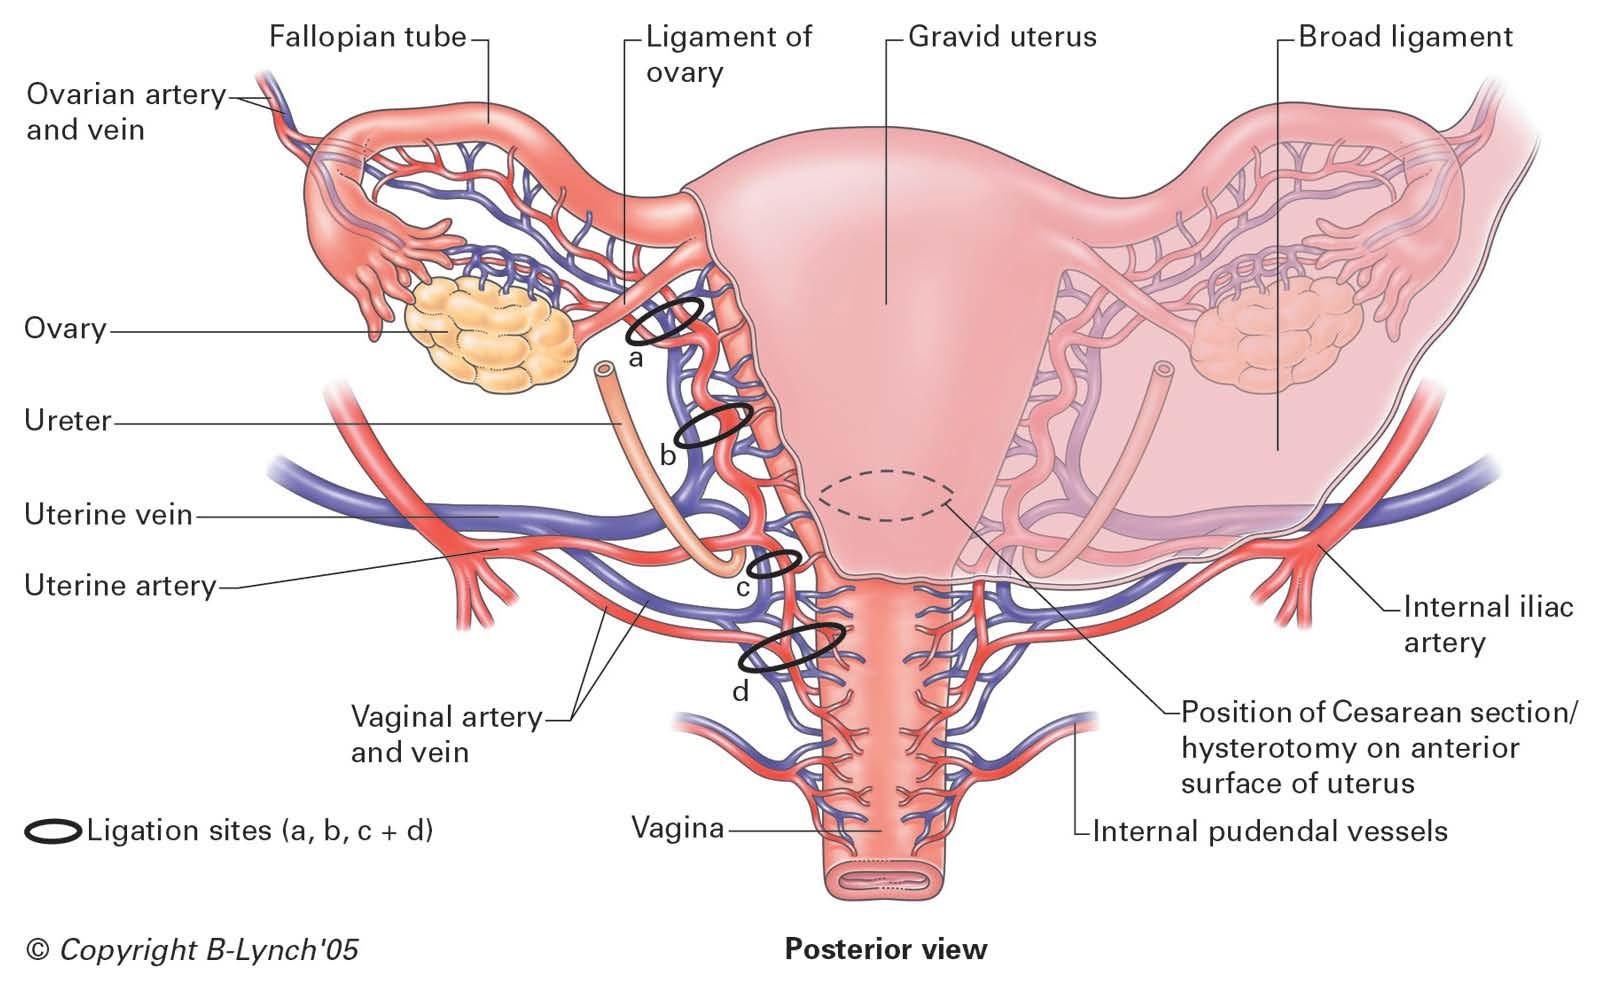 MS3 GYN: Dodson - Anatomy & Surgery Flashcards | Memorang